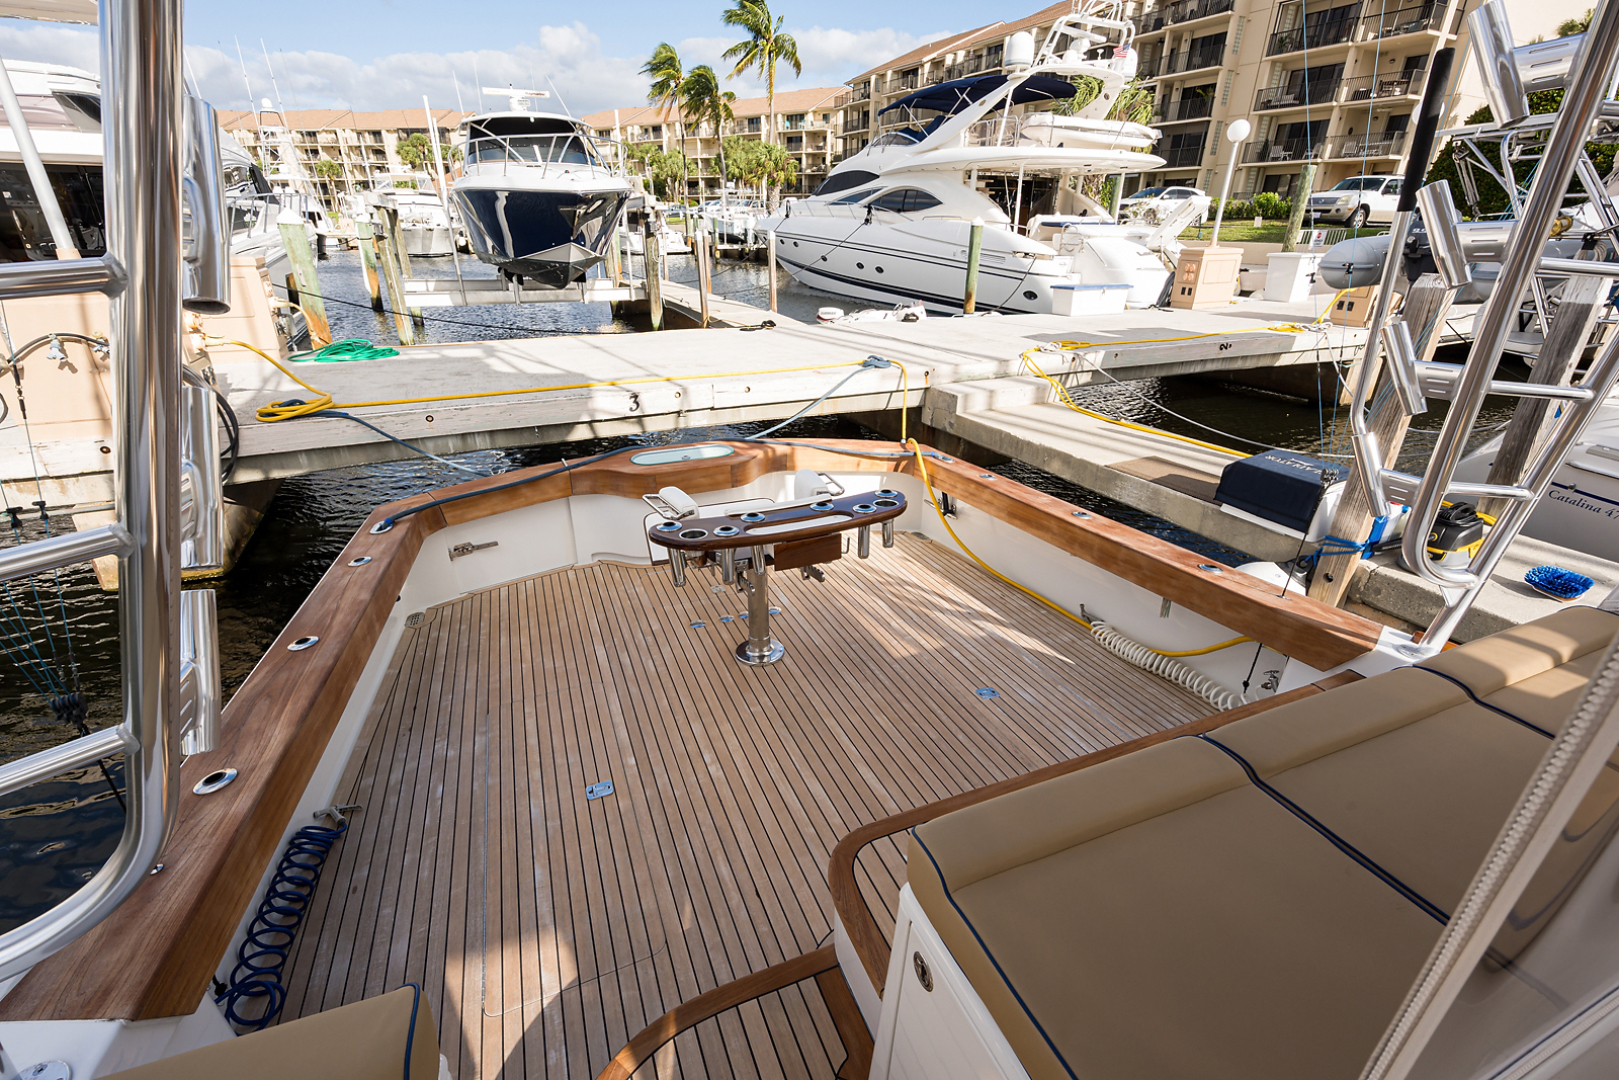 Release-One-of-A-Kind Custom Express 2014-Gladiator Jupiter-Florida-United States-Cockpit-1370104   Thumbnail